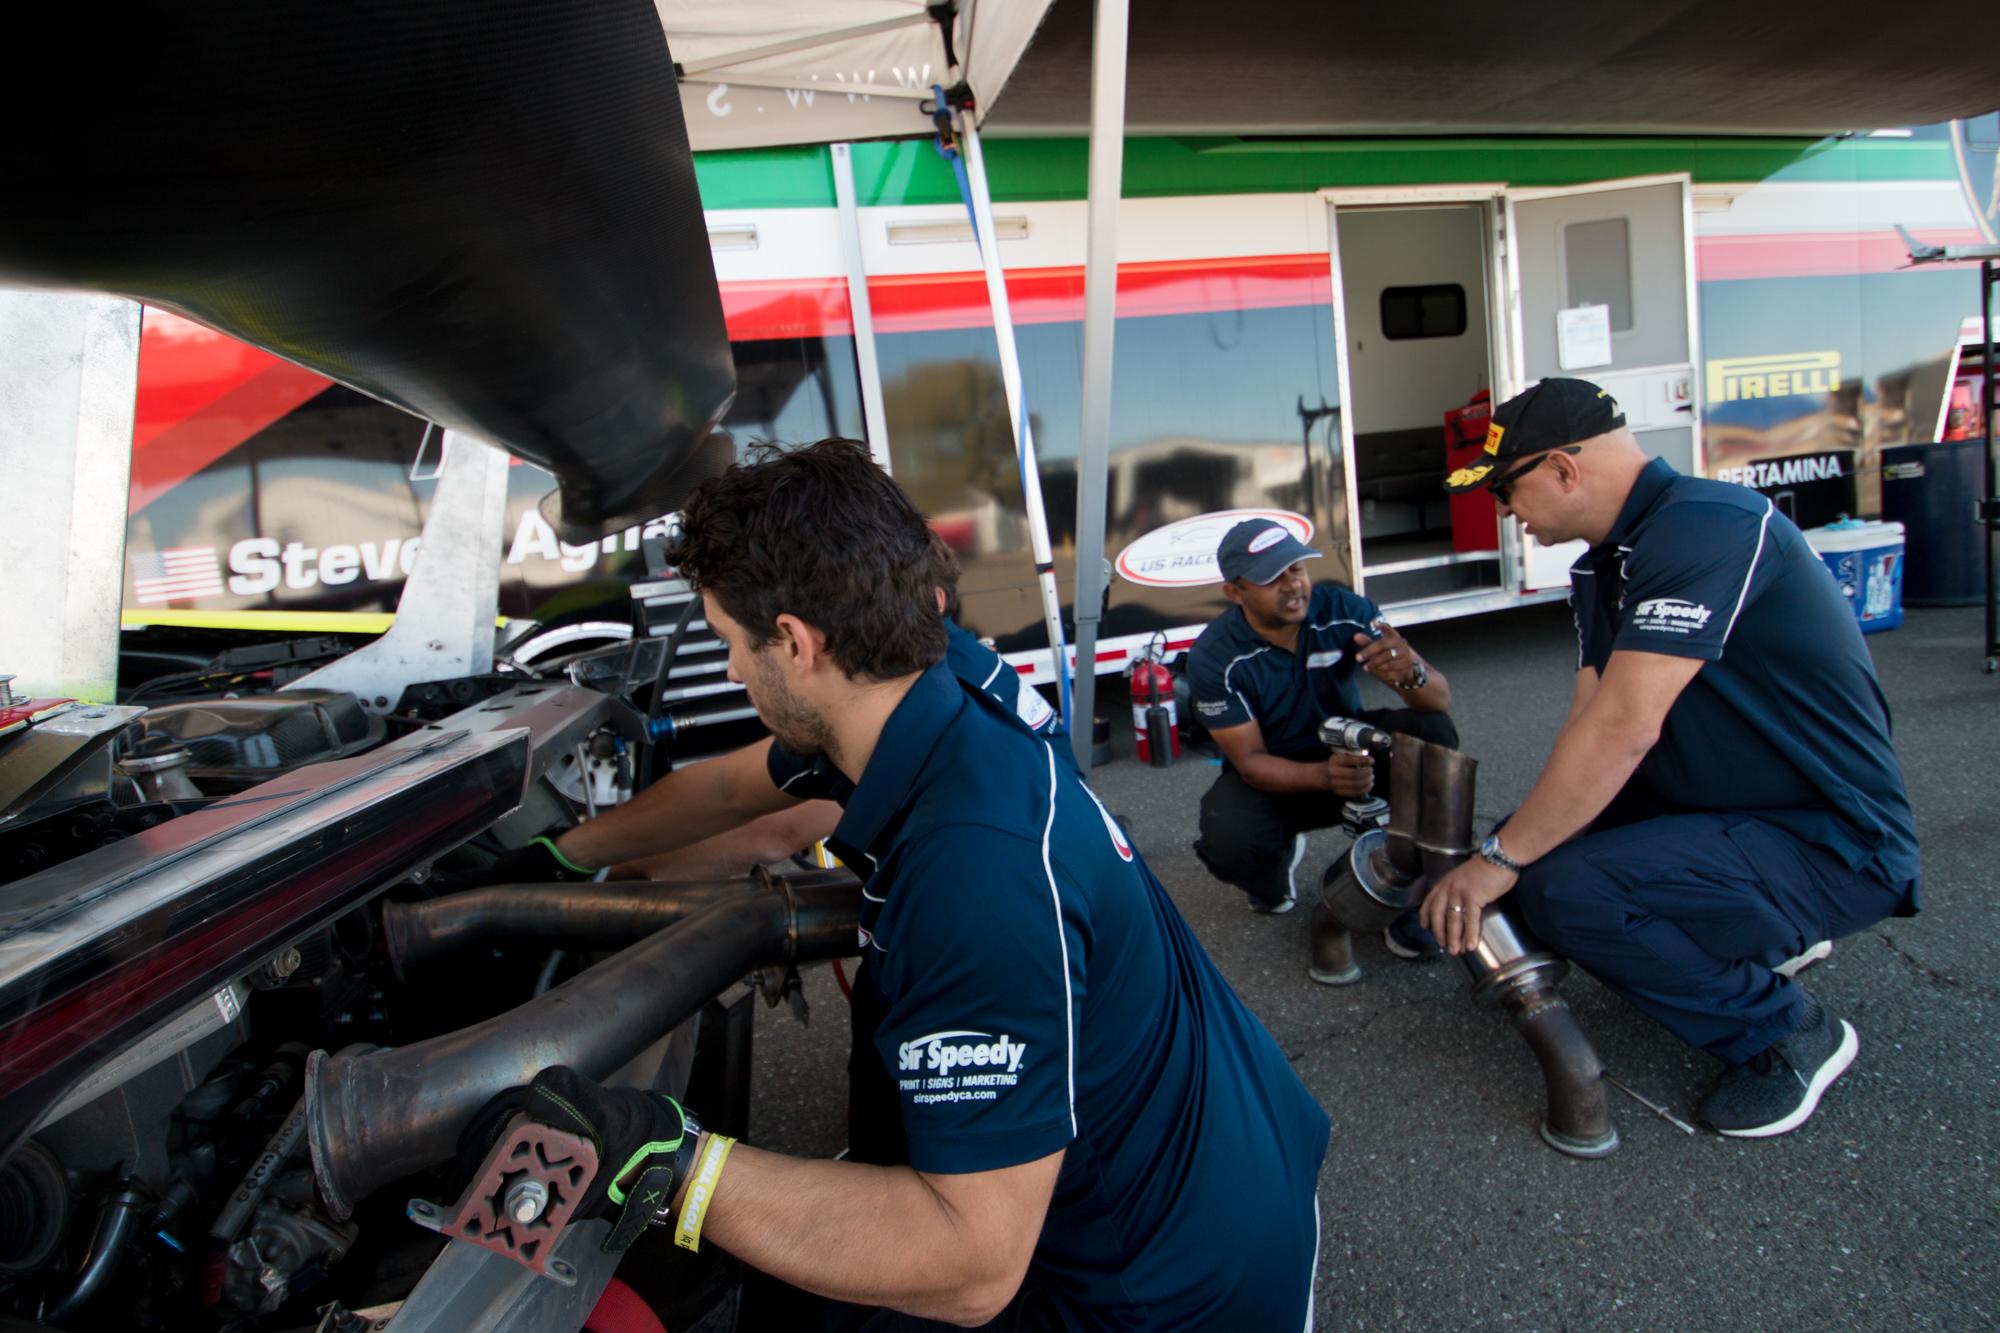 Steven-Racing-20130204-44751.jpg